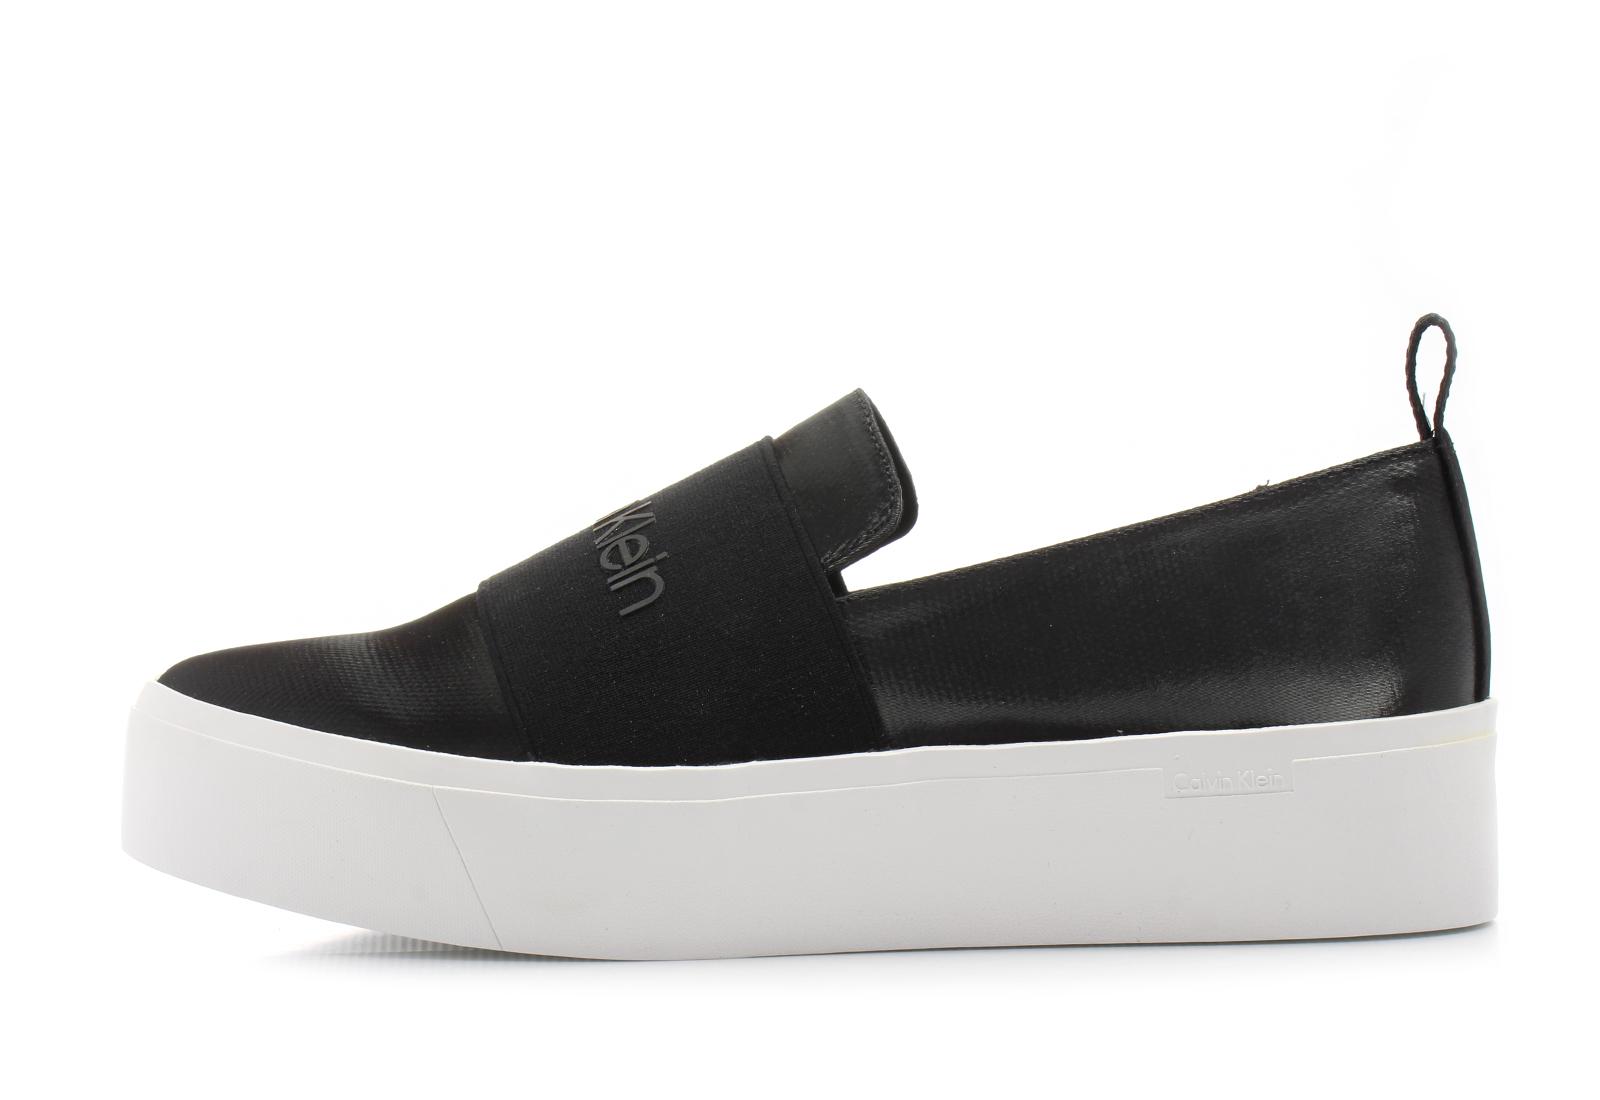 82a869fbd5 Calvin Klein Black Label Topánky - Jacinta - E6674-BLK - Tenisky ...